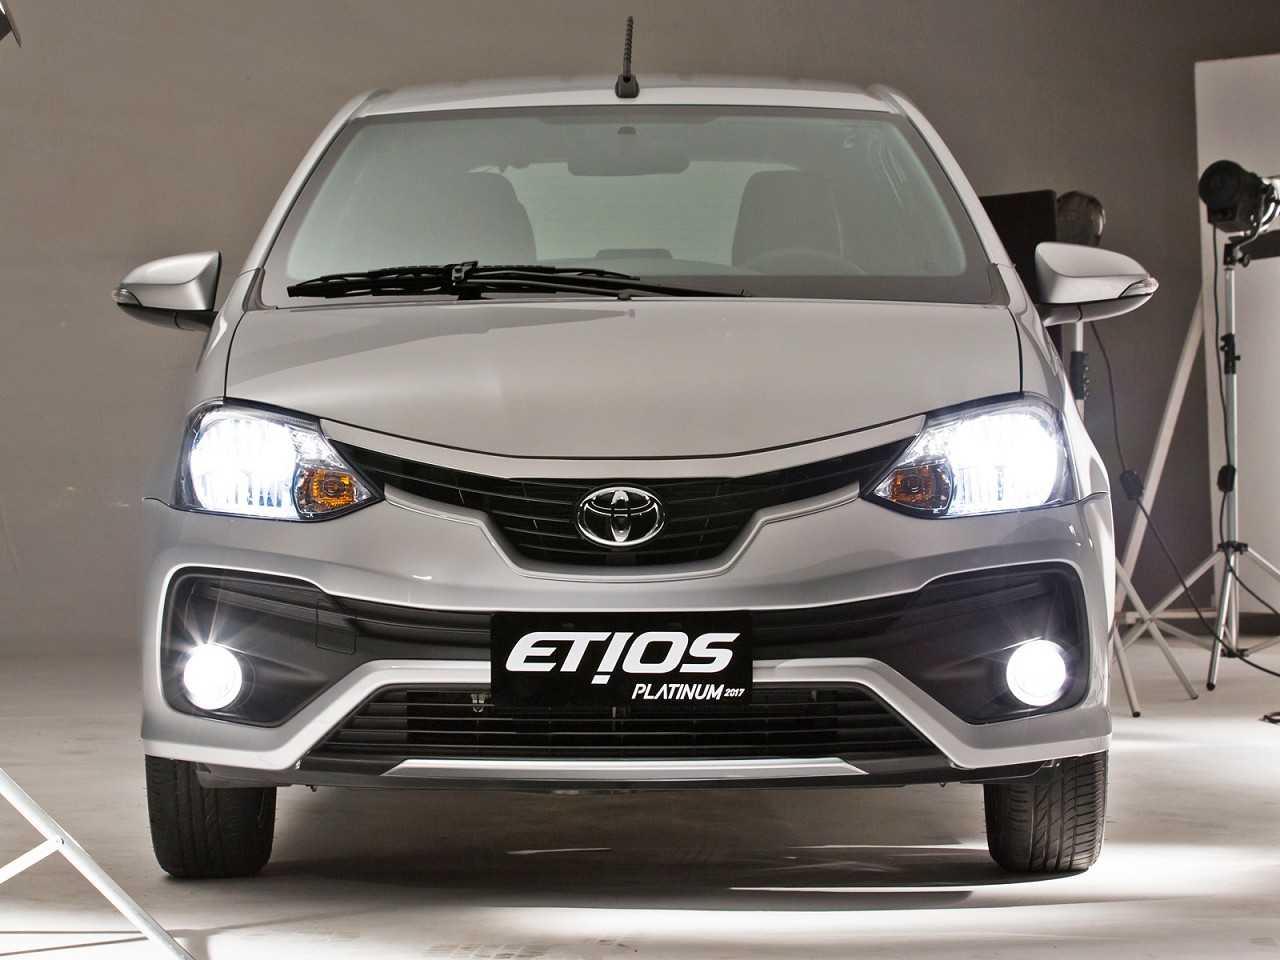 ToyotaEtios 2017 - frente